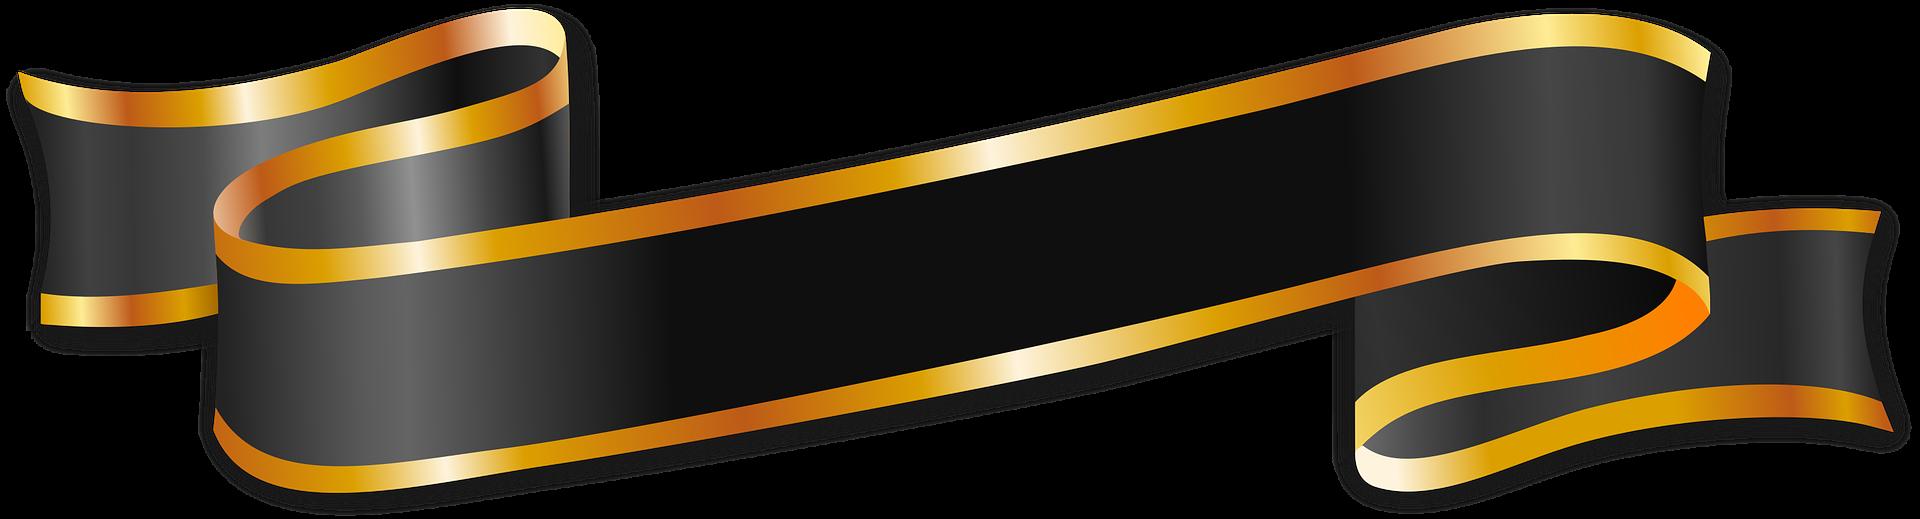 banner-3328884_1920